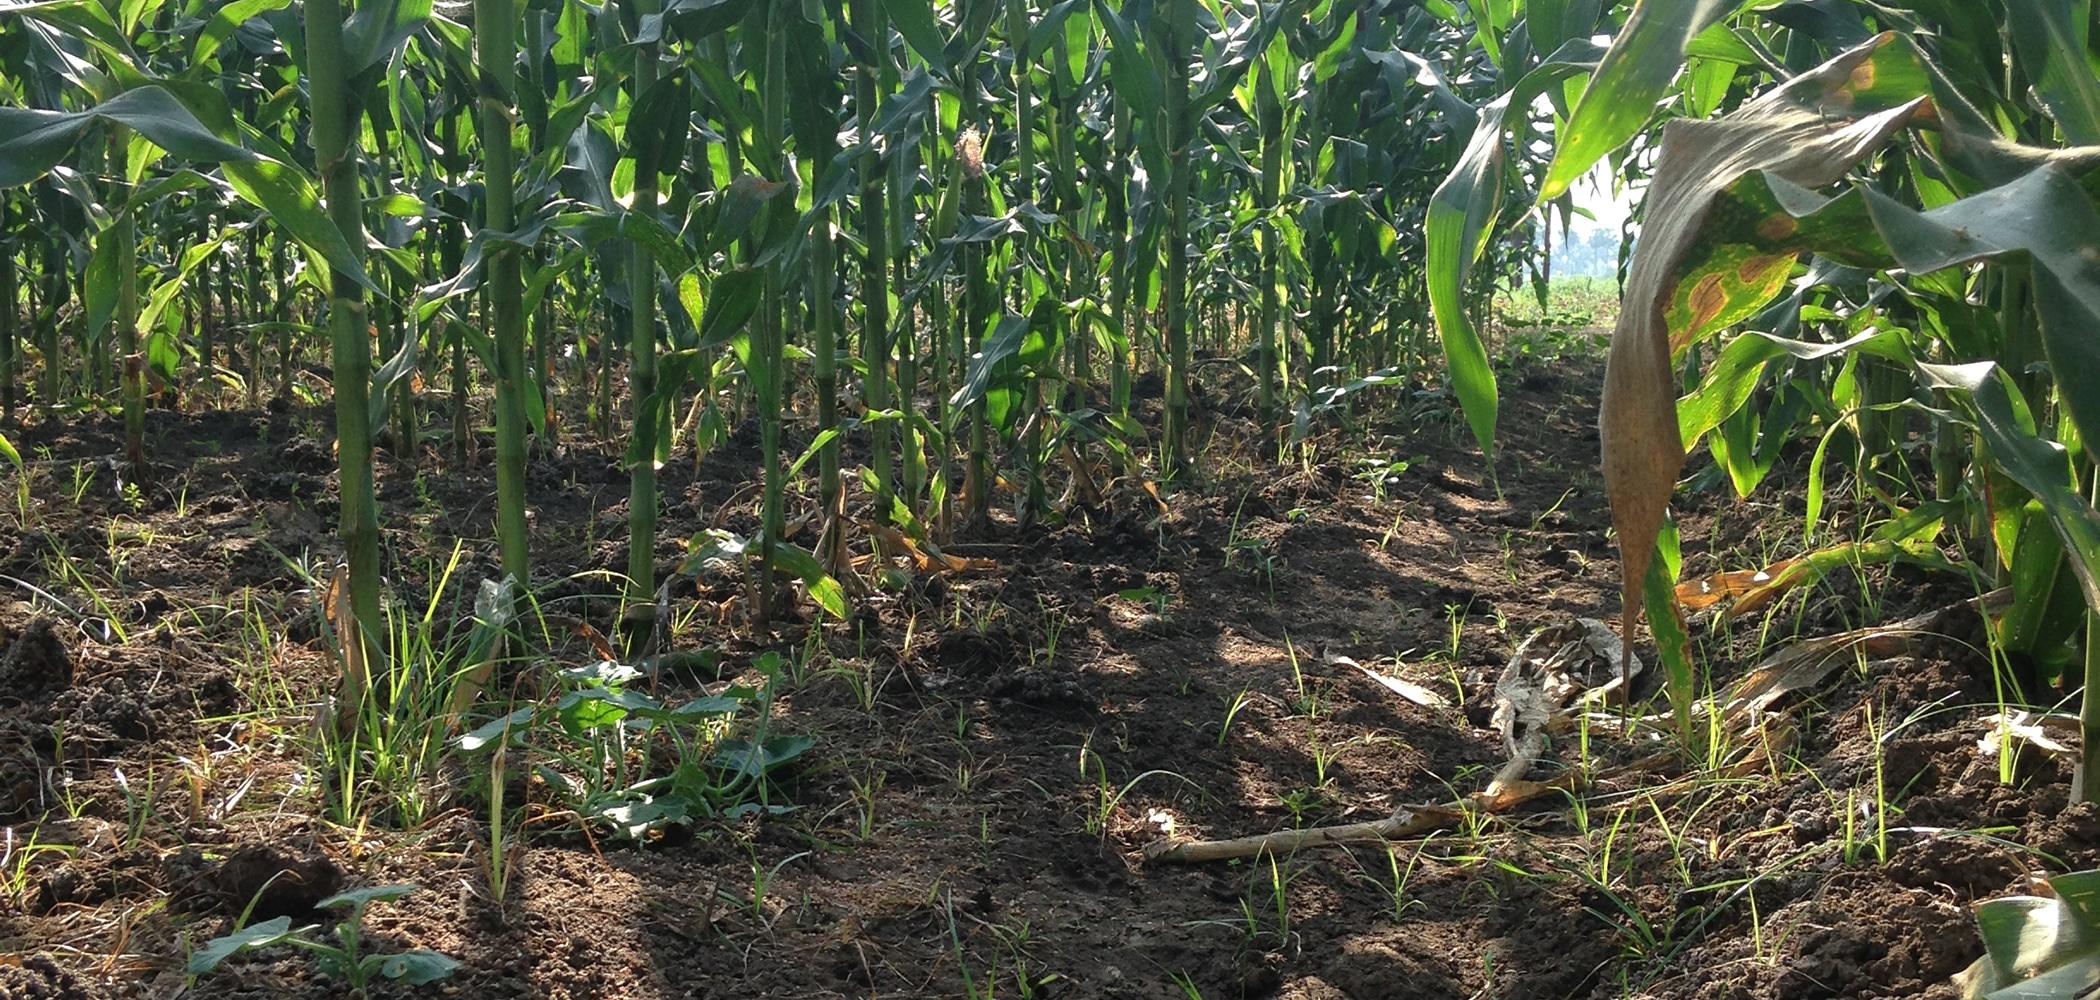 ground view of cornfield soil